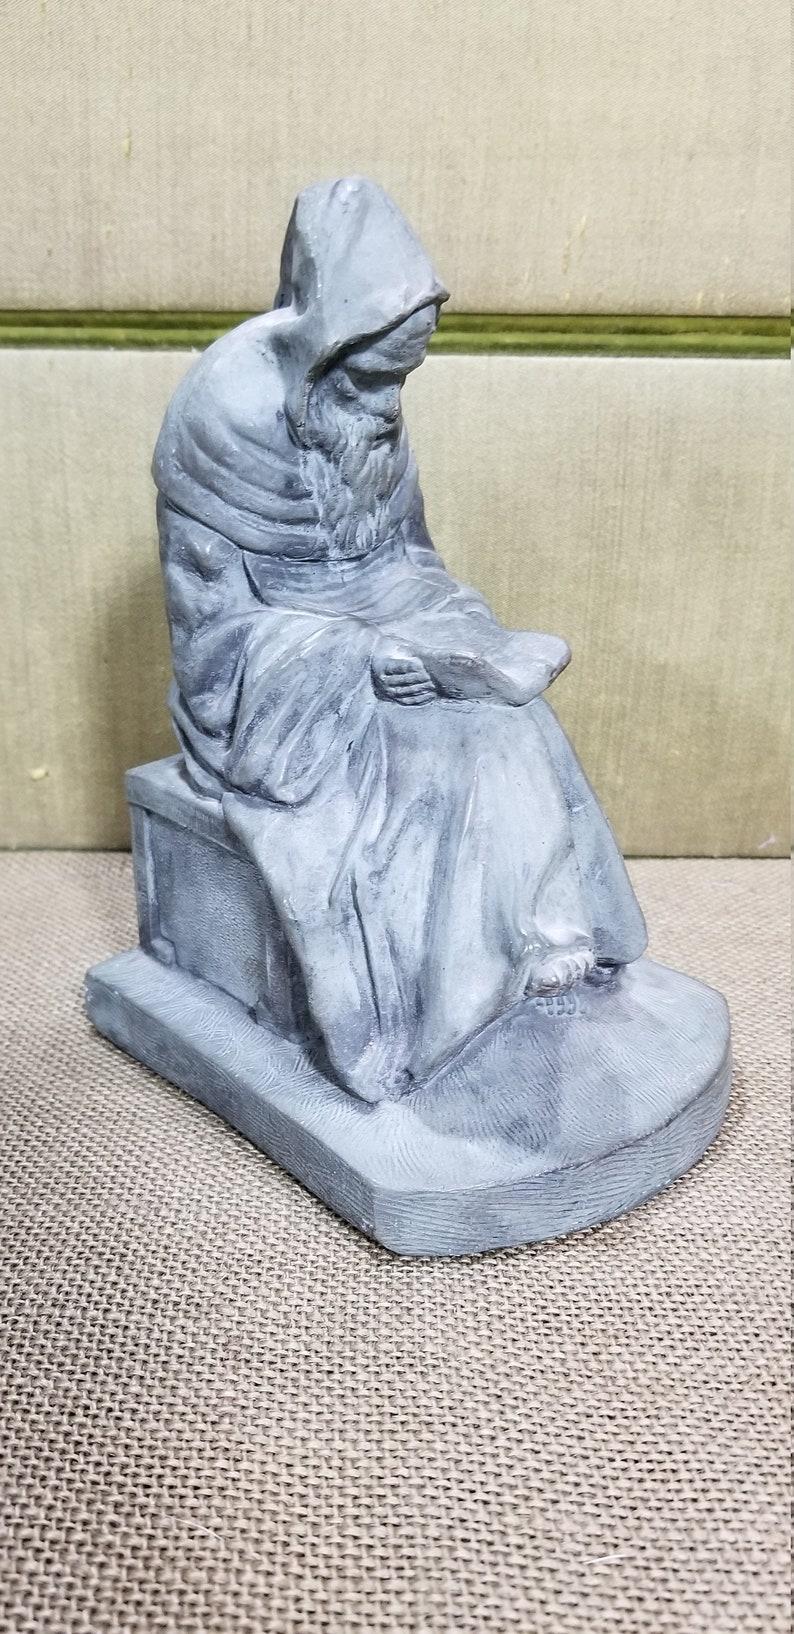 1972 Mike Makras Cincinnati Ohio Artwork English Stone Type Architectural Gothic Statue Human Figural Monk Reader Bookend